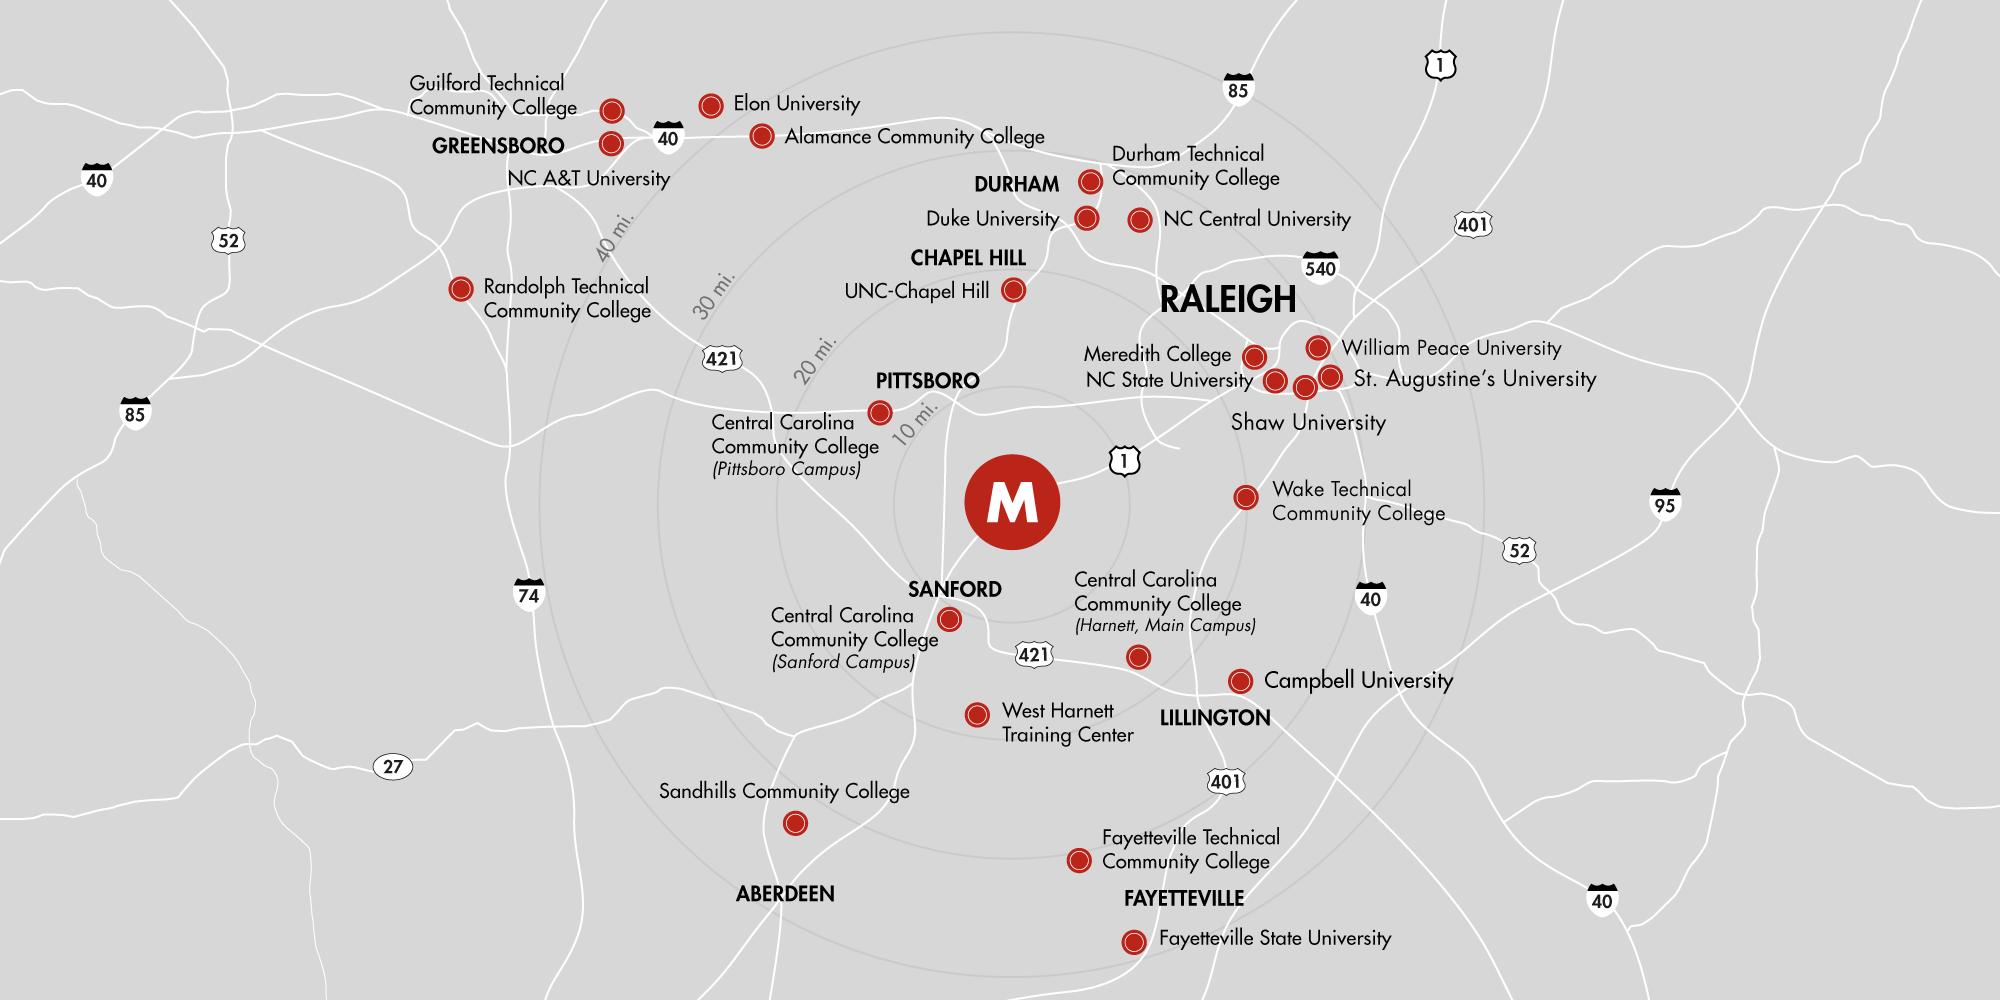 university-map-2x1.png